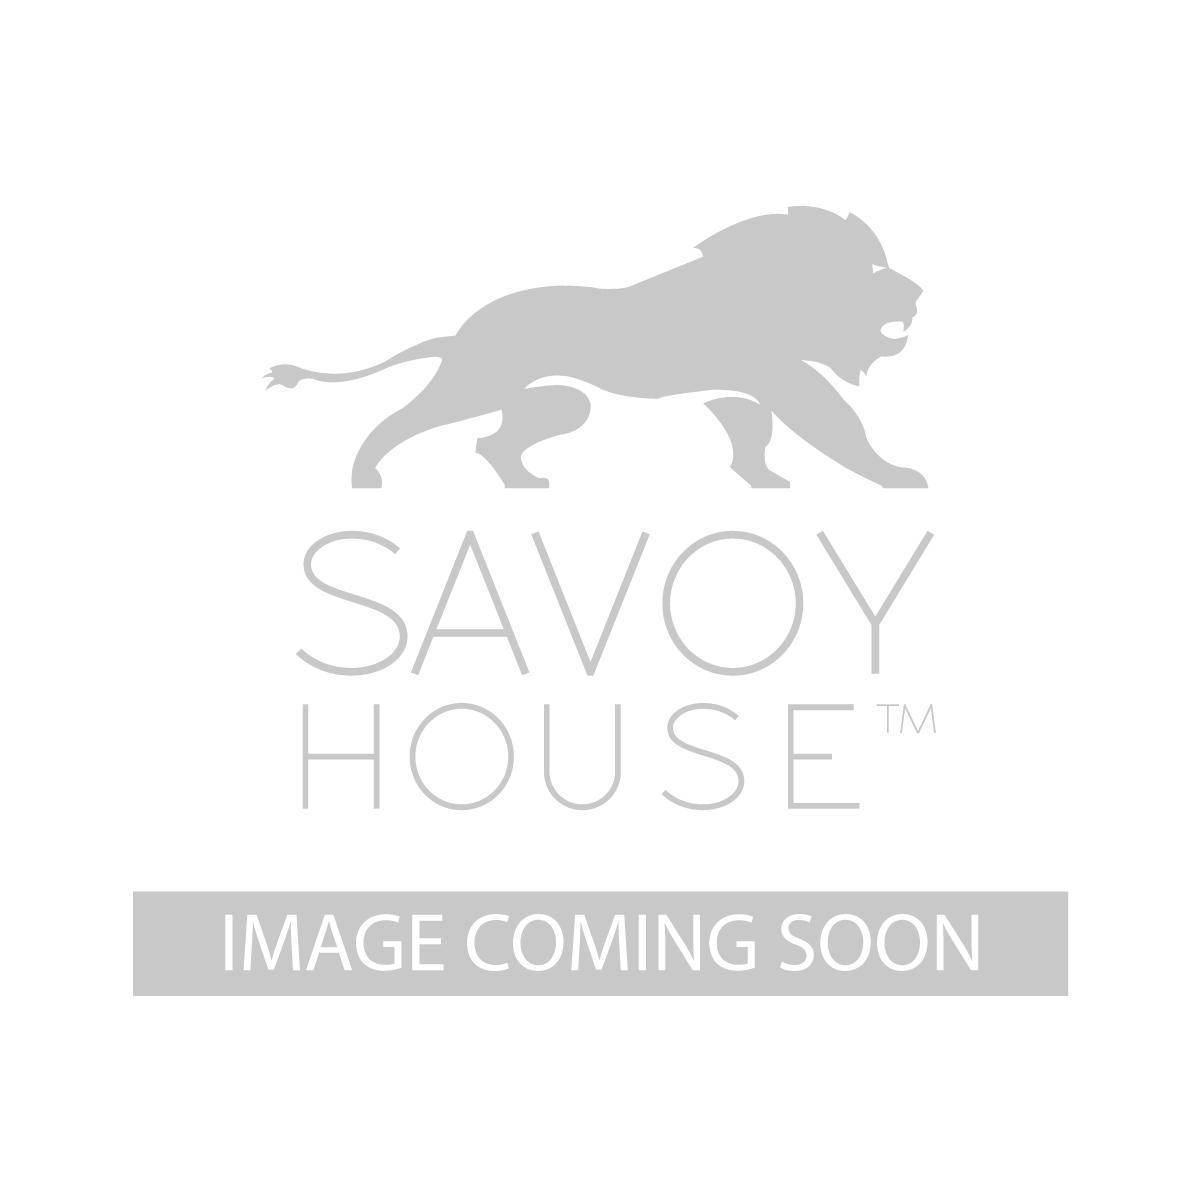 8 4658 4 69 wilmont 4 light bath bar by savoy house wilmont 4 light bath bar aloadofball Images